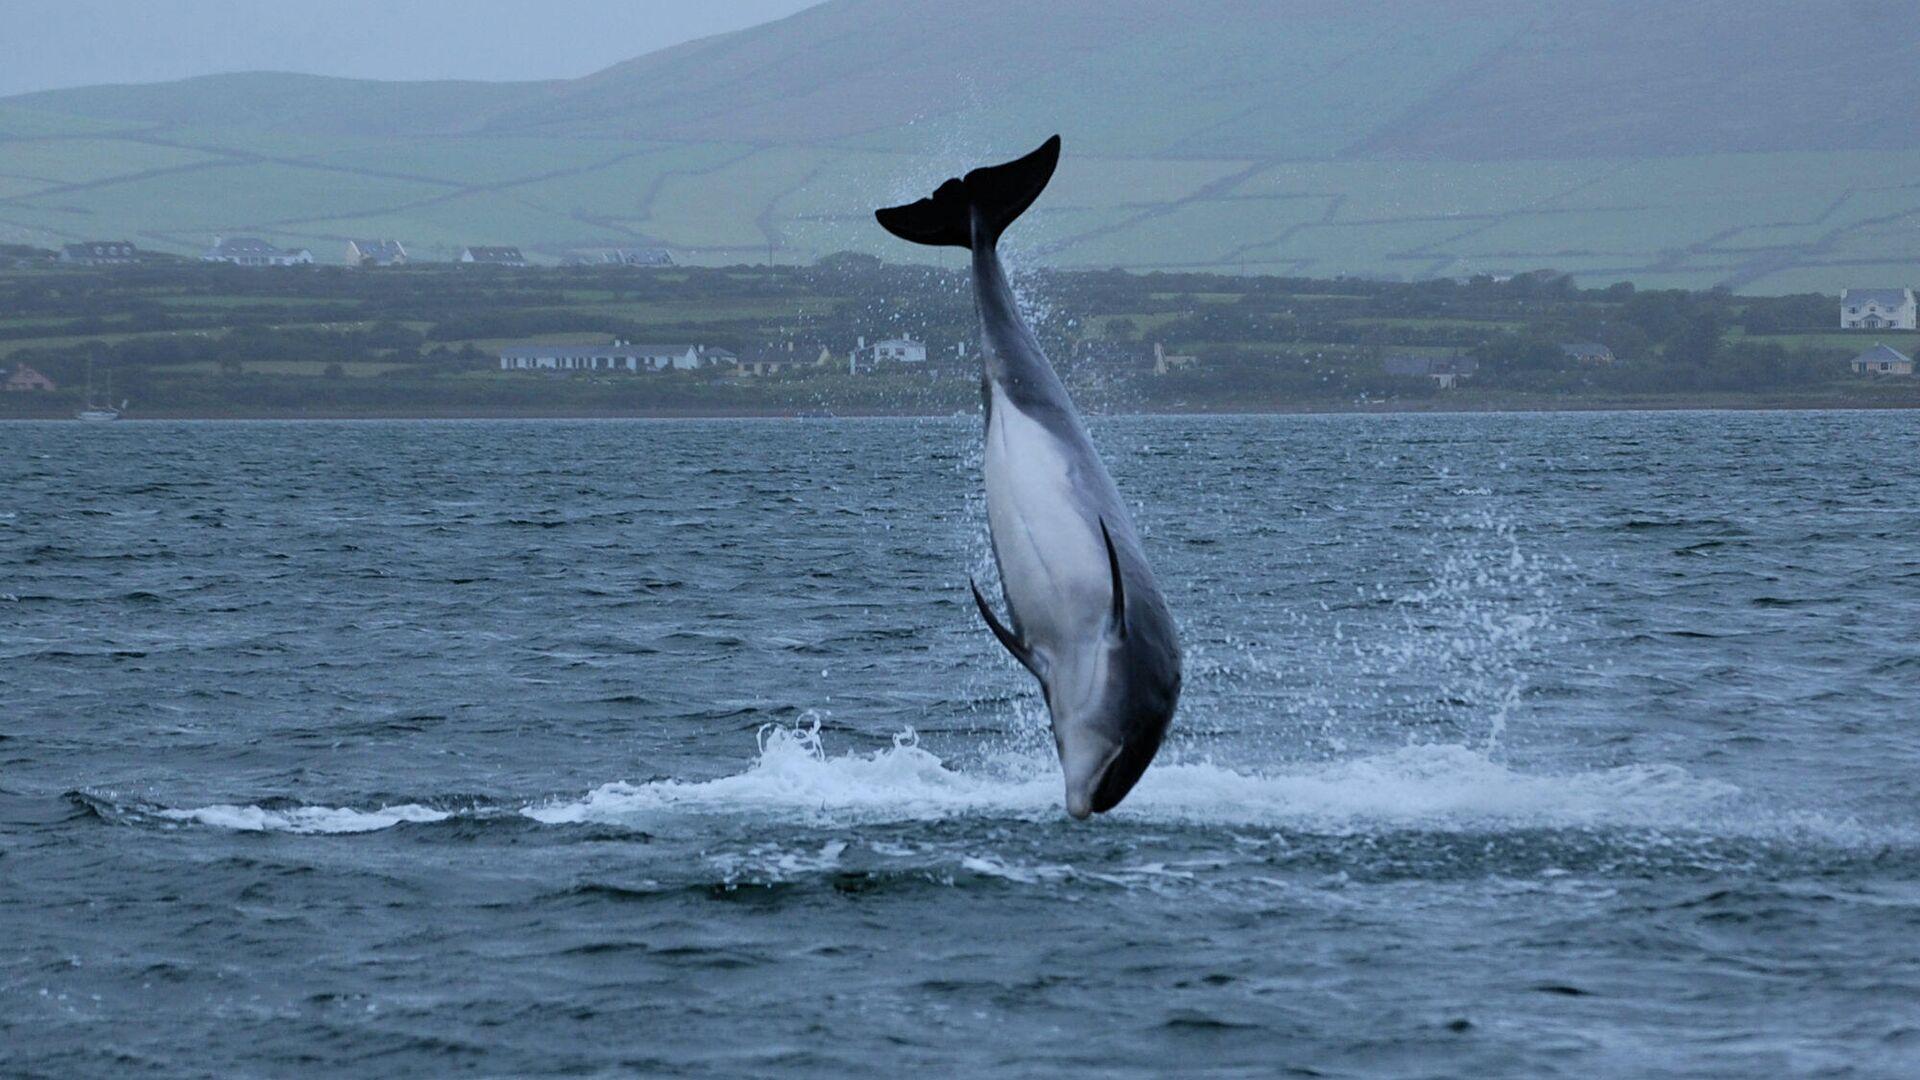 "Ирландский политик заявил о пропаже знаменитого дельфина ""из-за Путина"" -  РИА Новости, 26.01.2021"